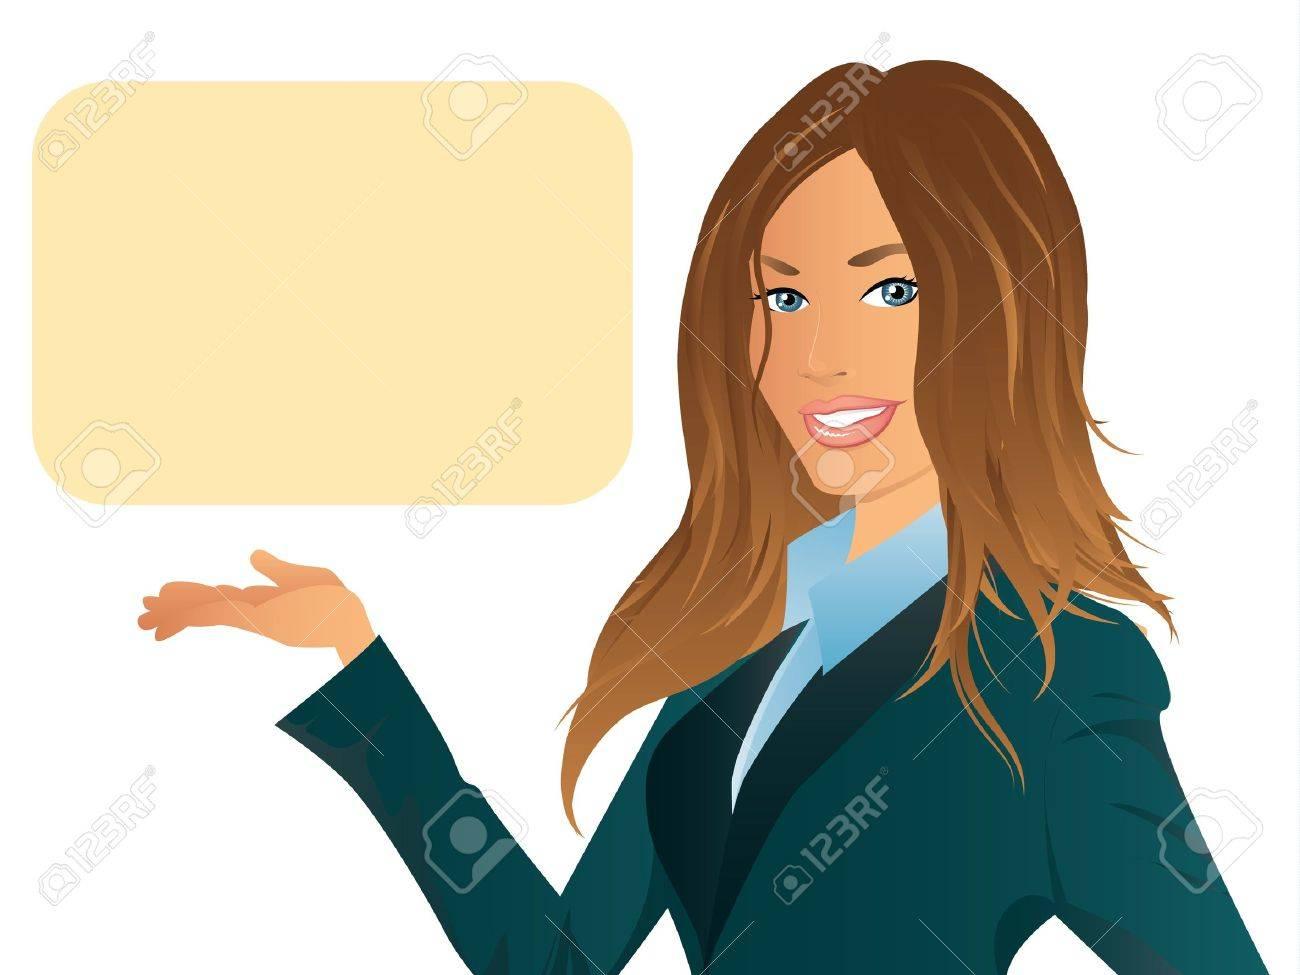 Business Woman Illustration Stock Vector - 15932683